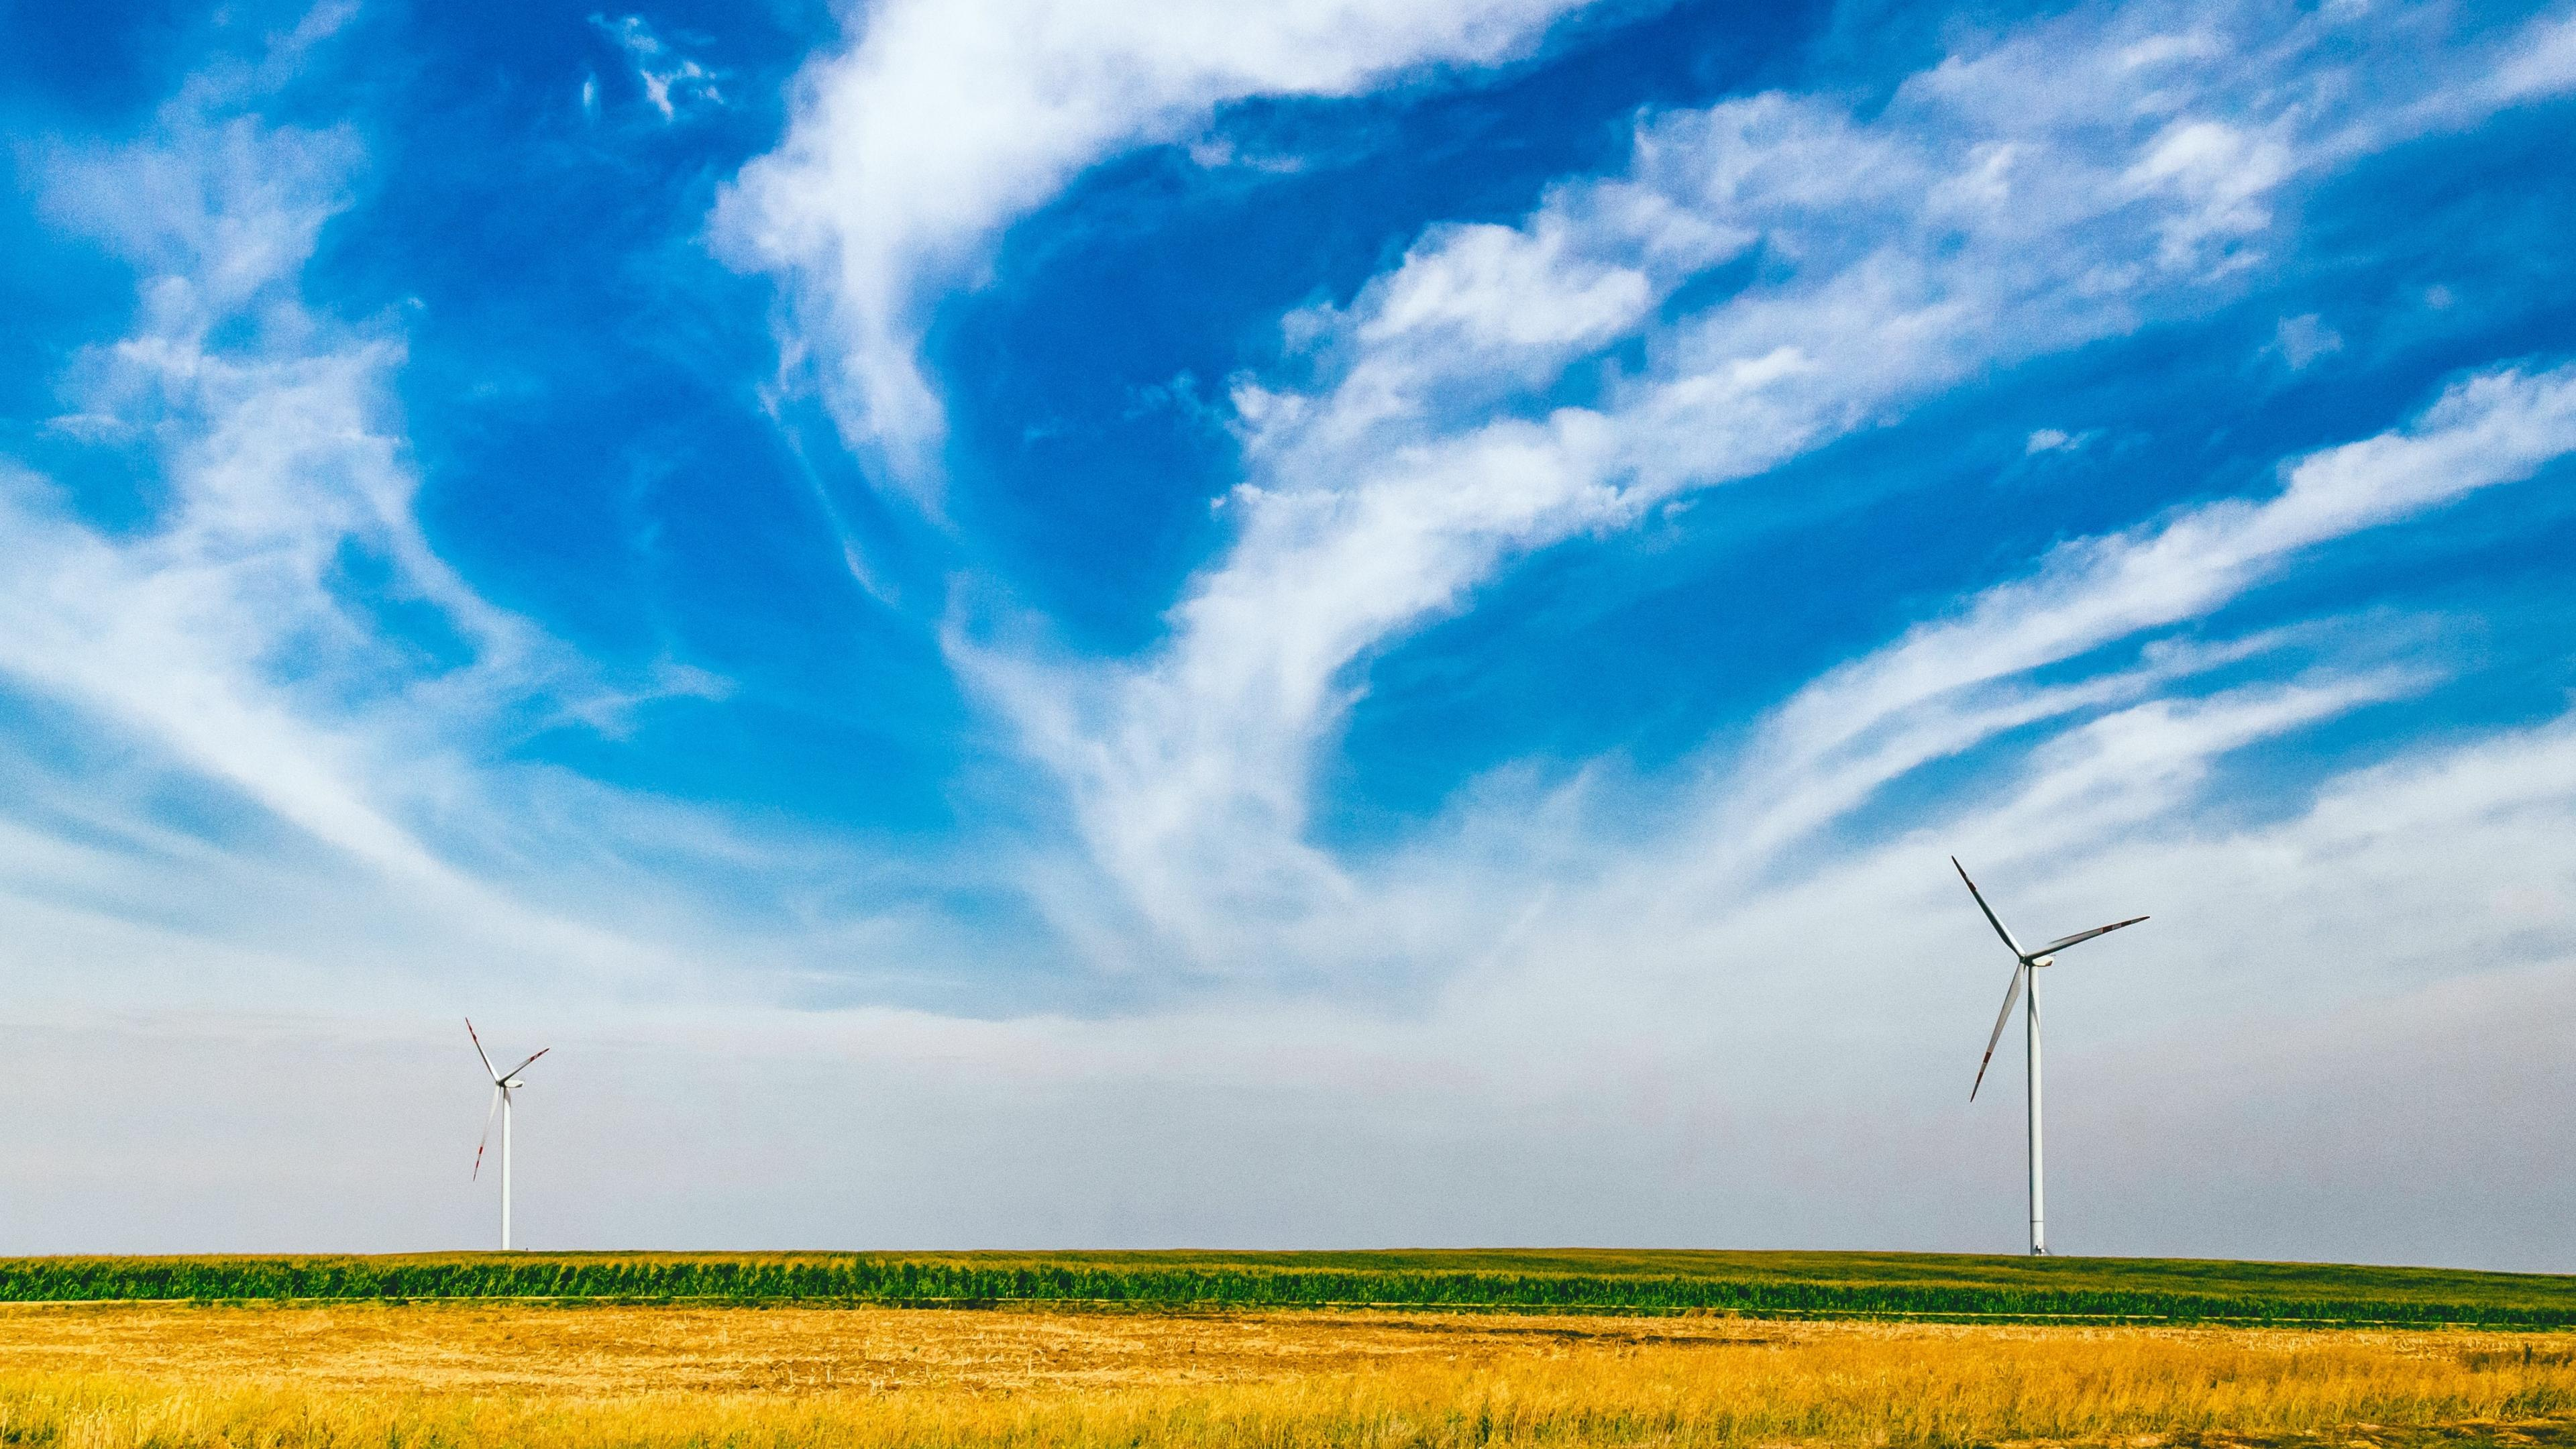 Wine turbines in a field against a cloudy blue sky